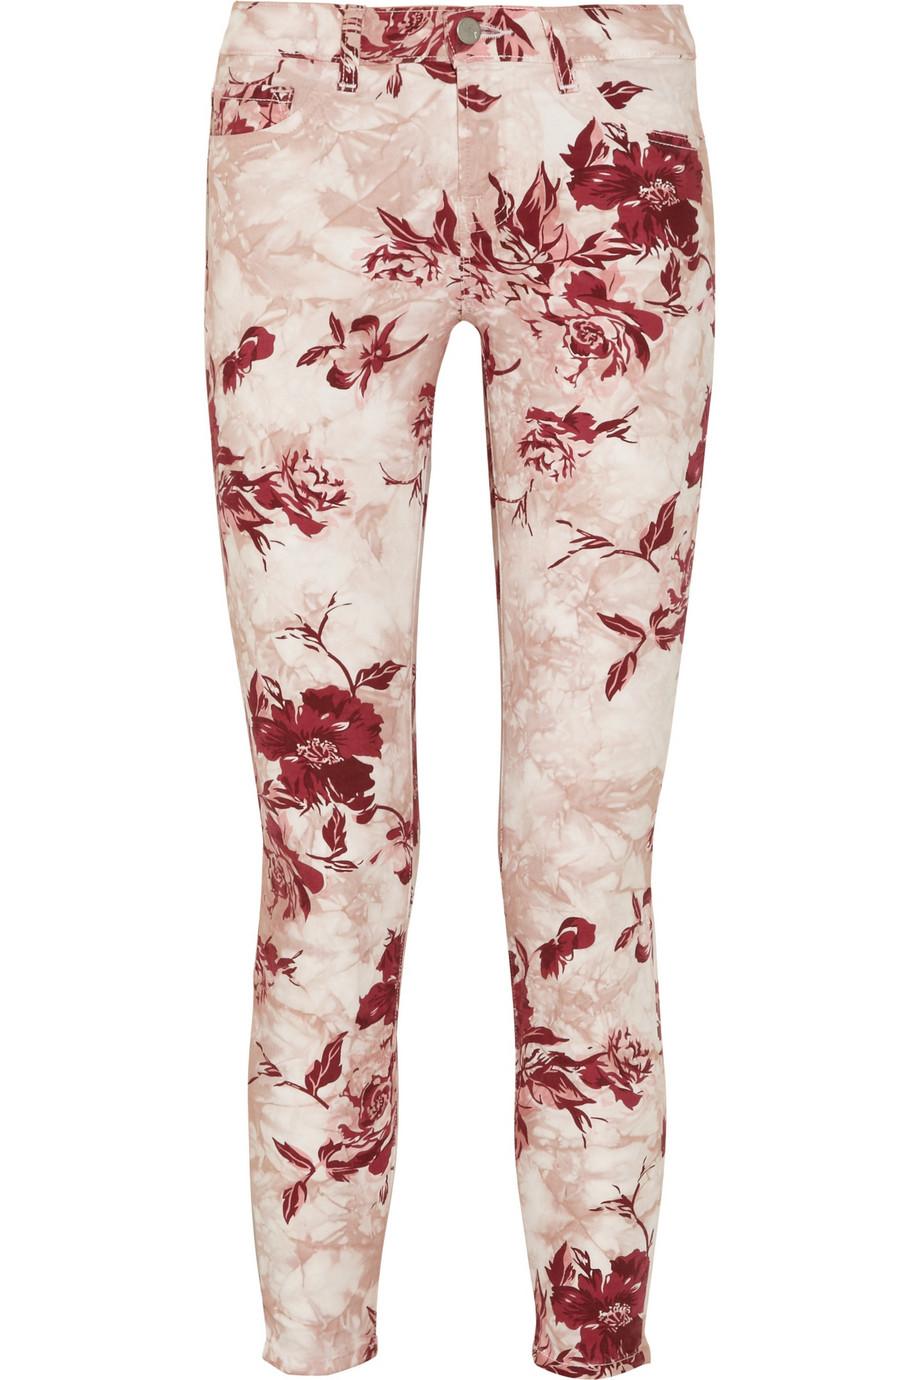 J brand Printed Midrise Skinny Jeans in Pink